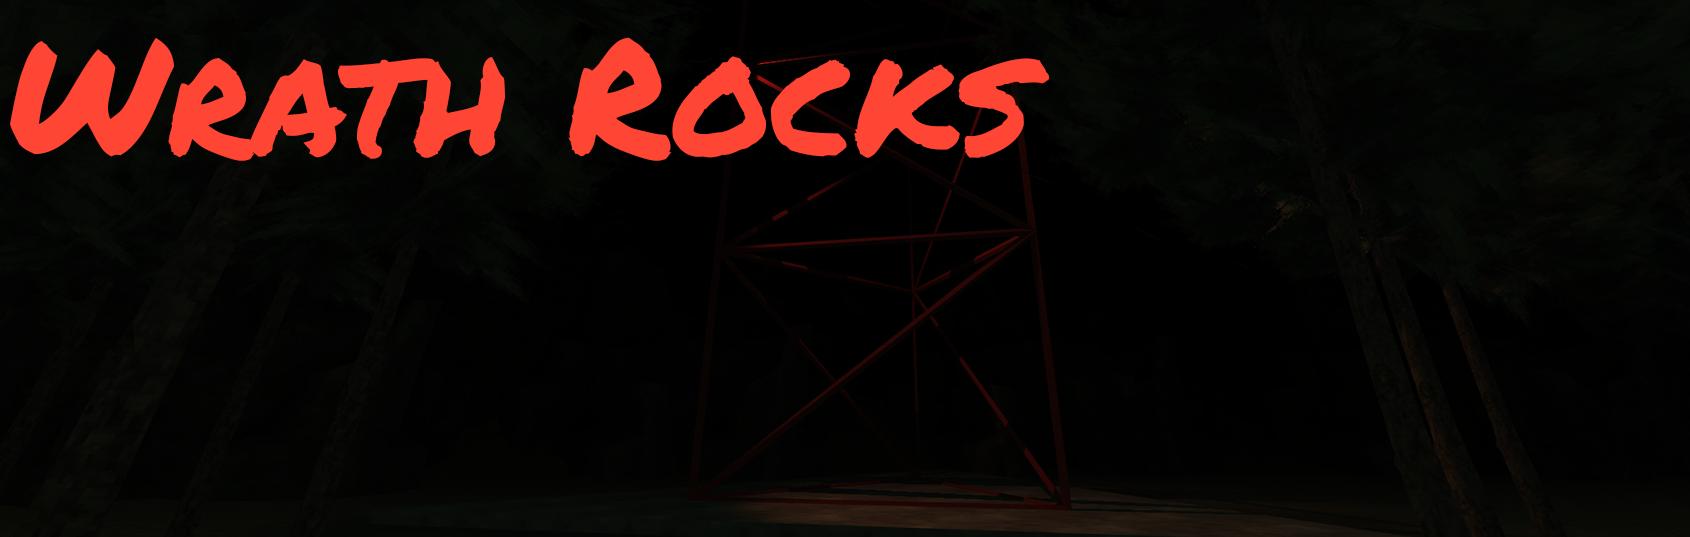 Wrath Rocks